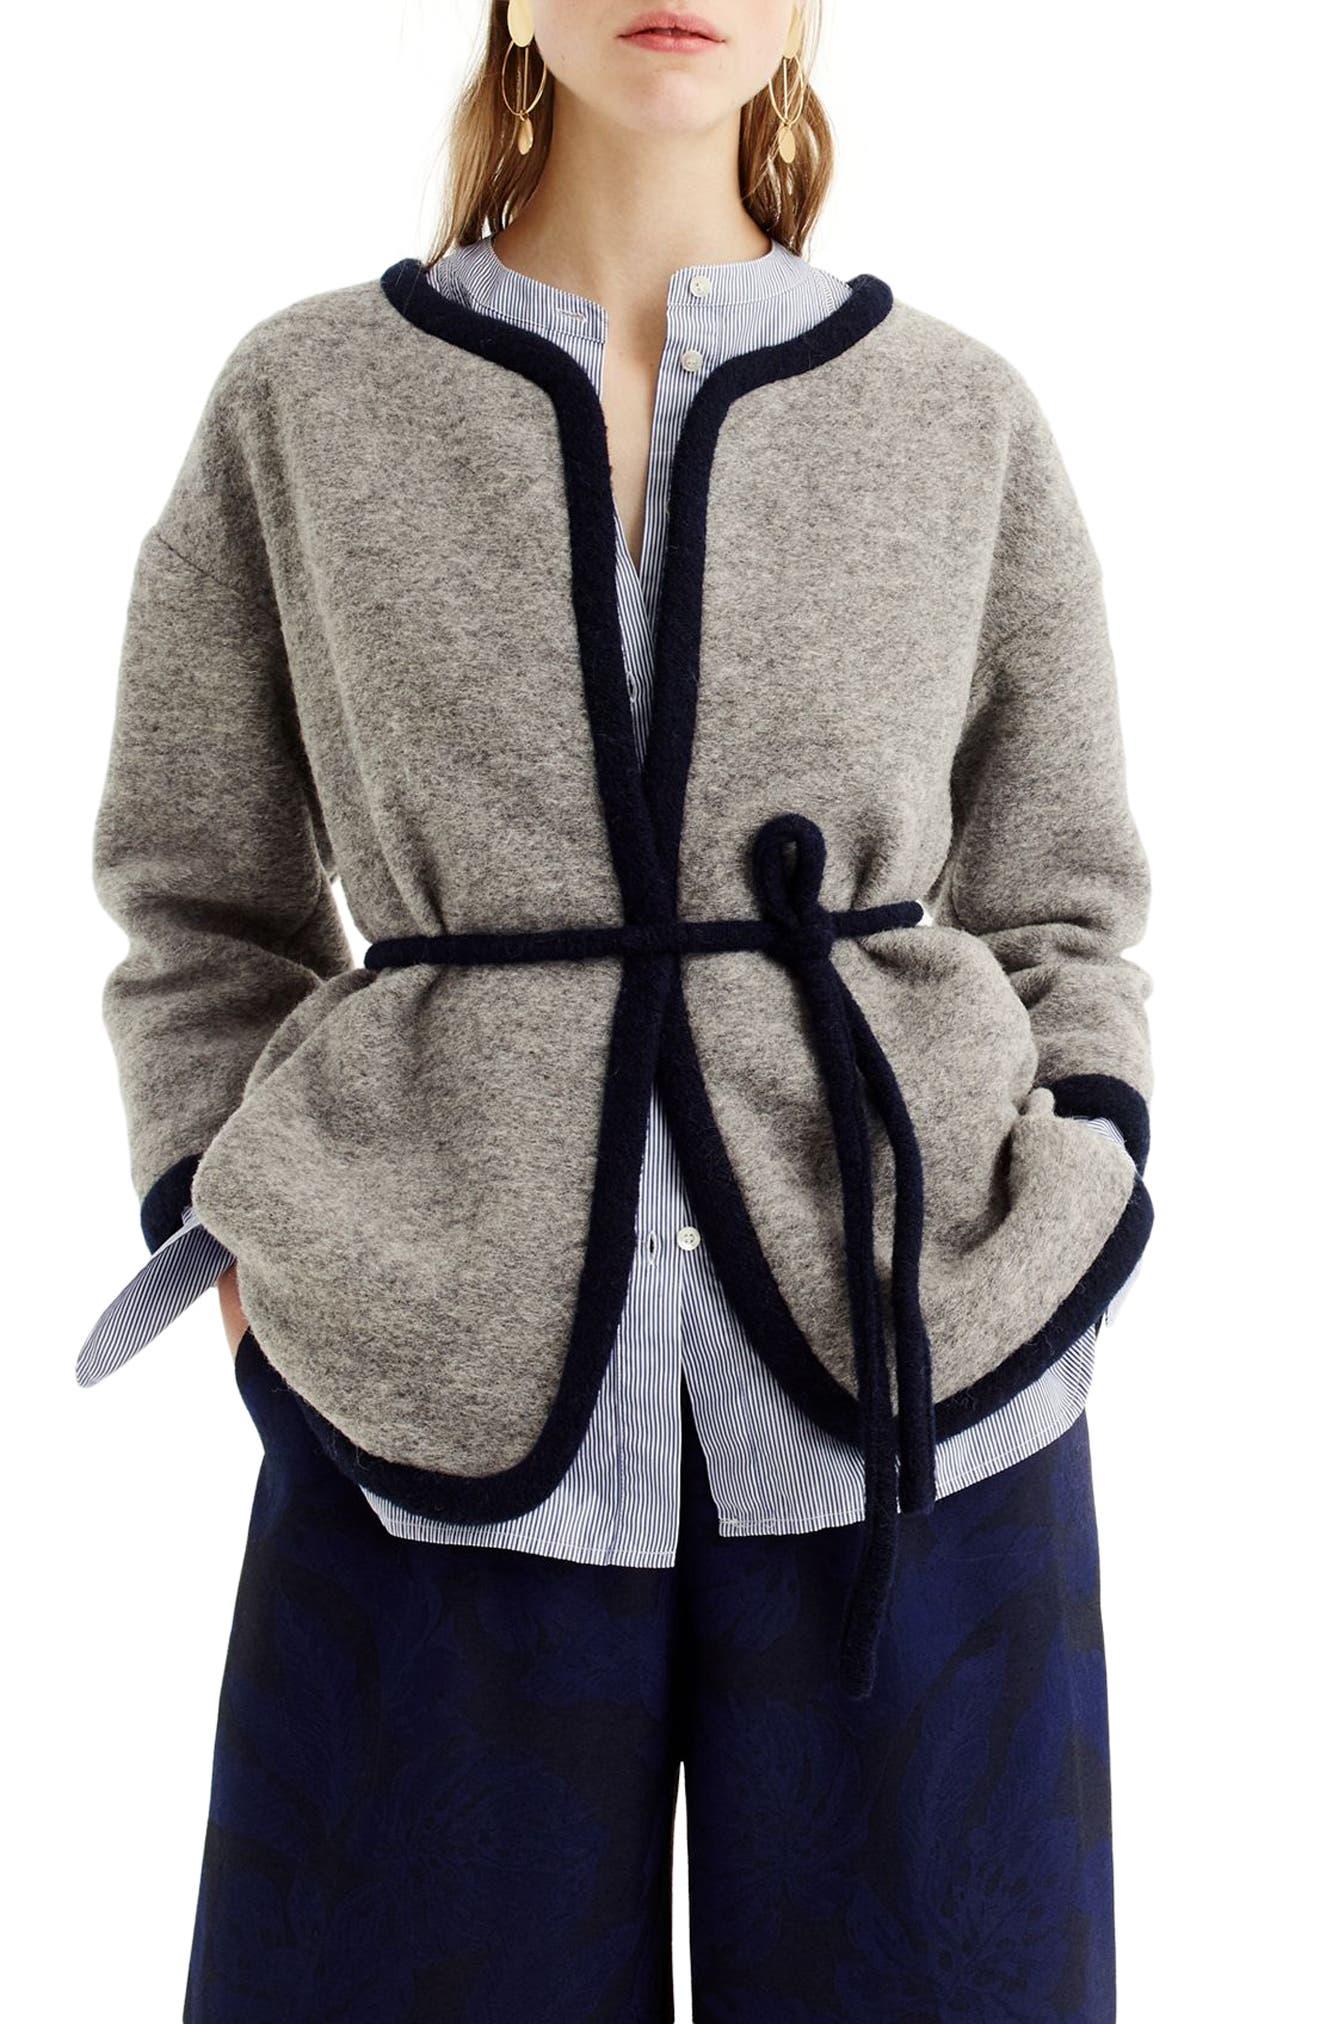 Main Image - J.Crew Branford Boiled Wool Blend Jacket